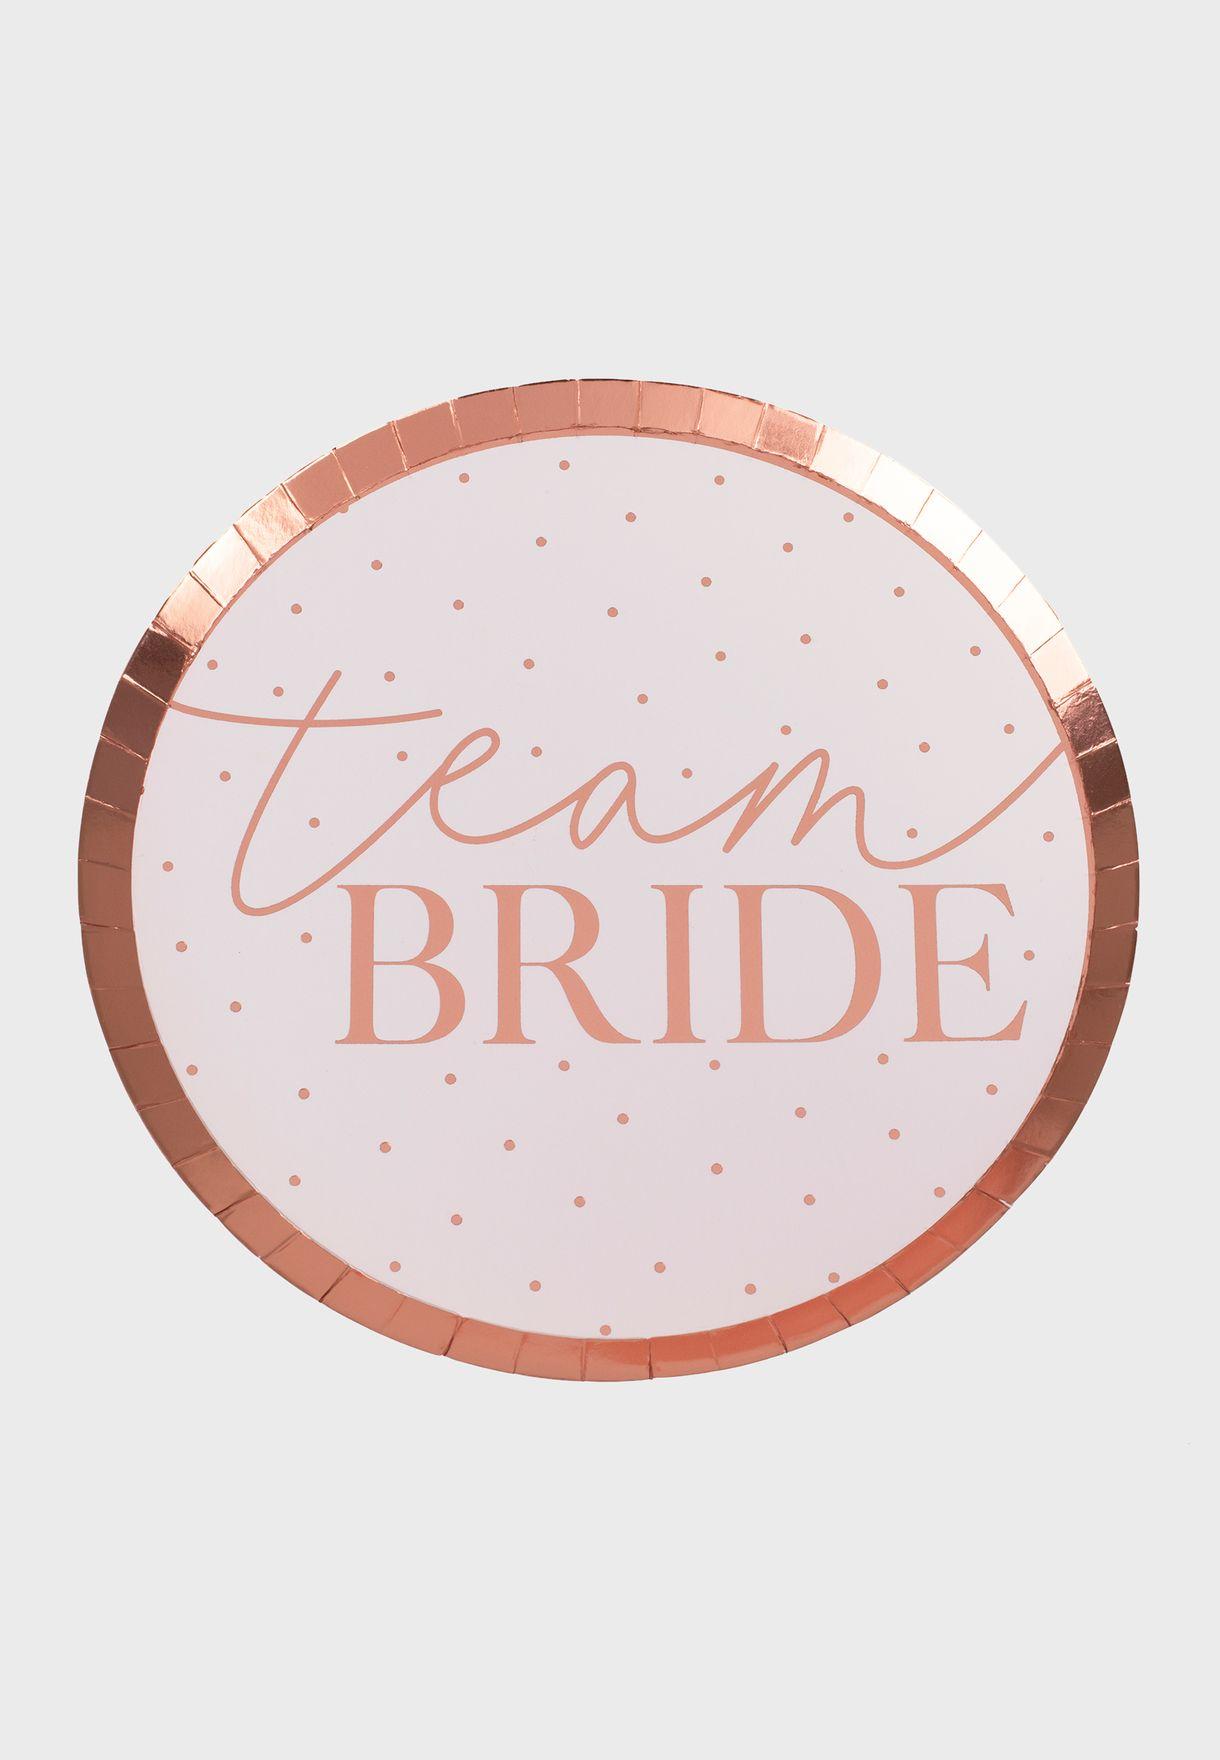 Team Bride Plate